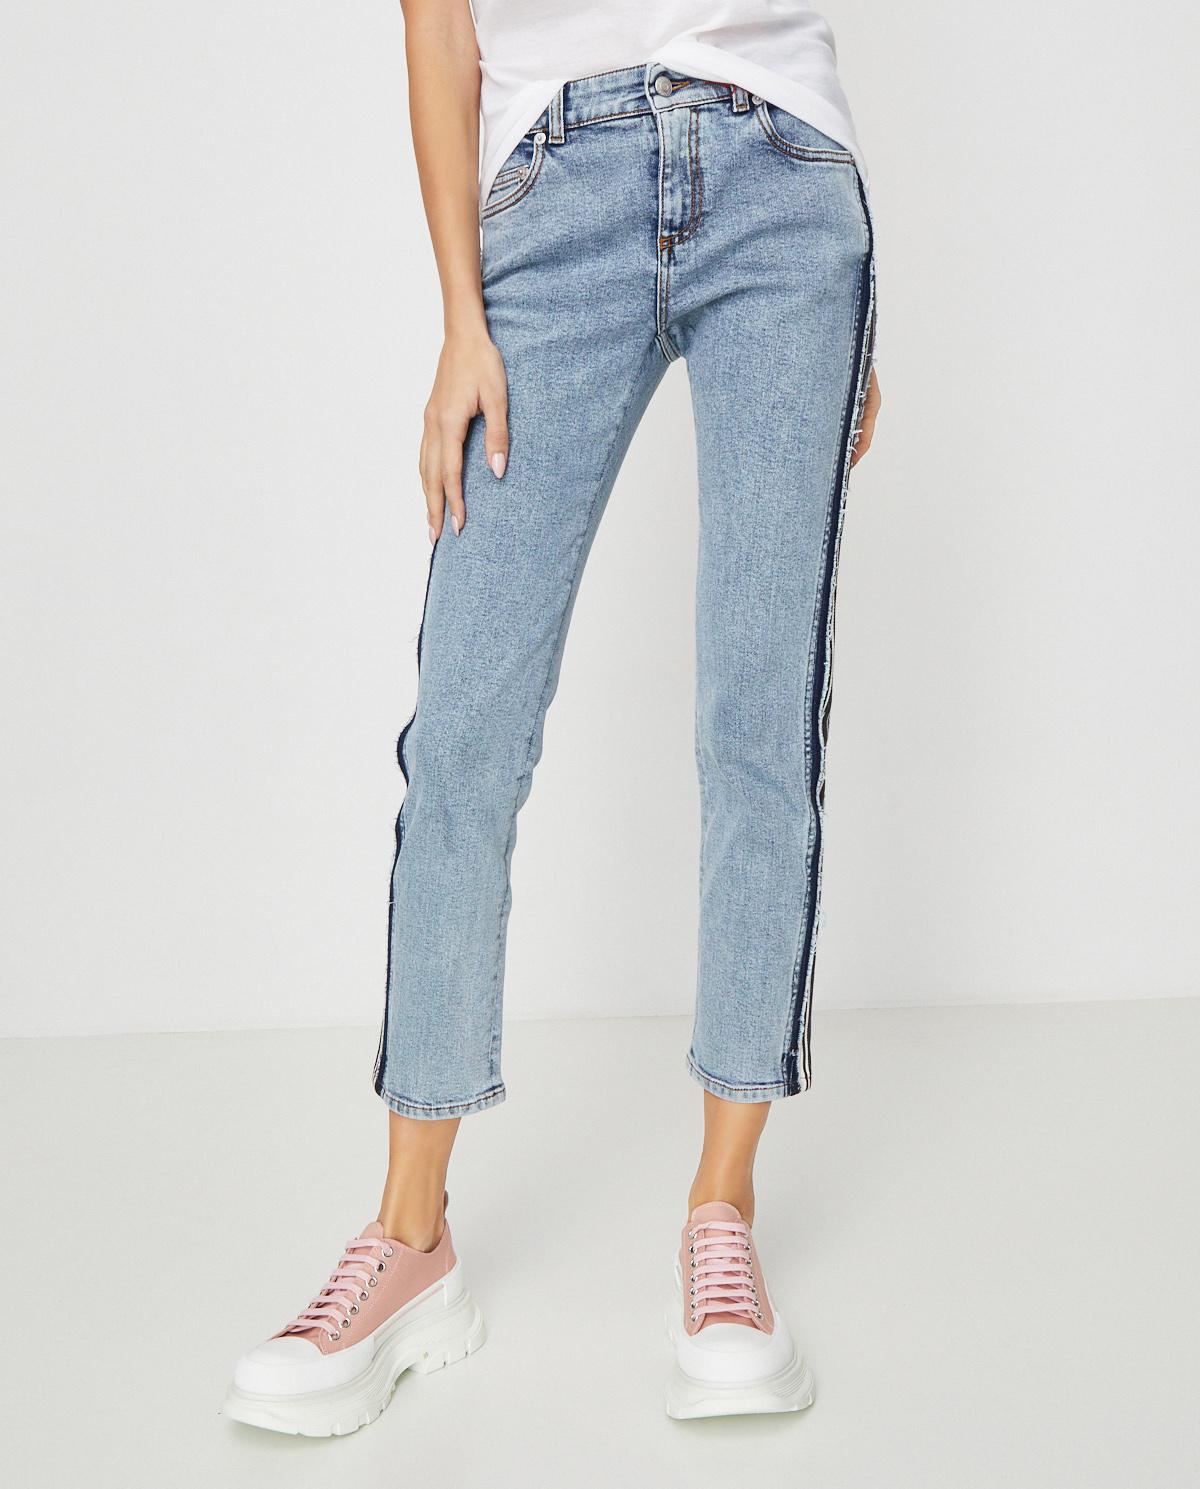 Spodnie jeansowe z lampasami Alexander McQueen 620055 QMAAQ 4064